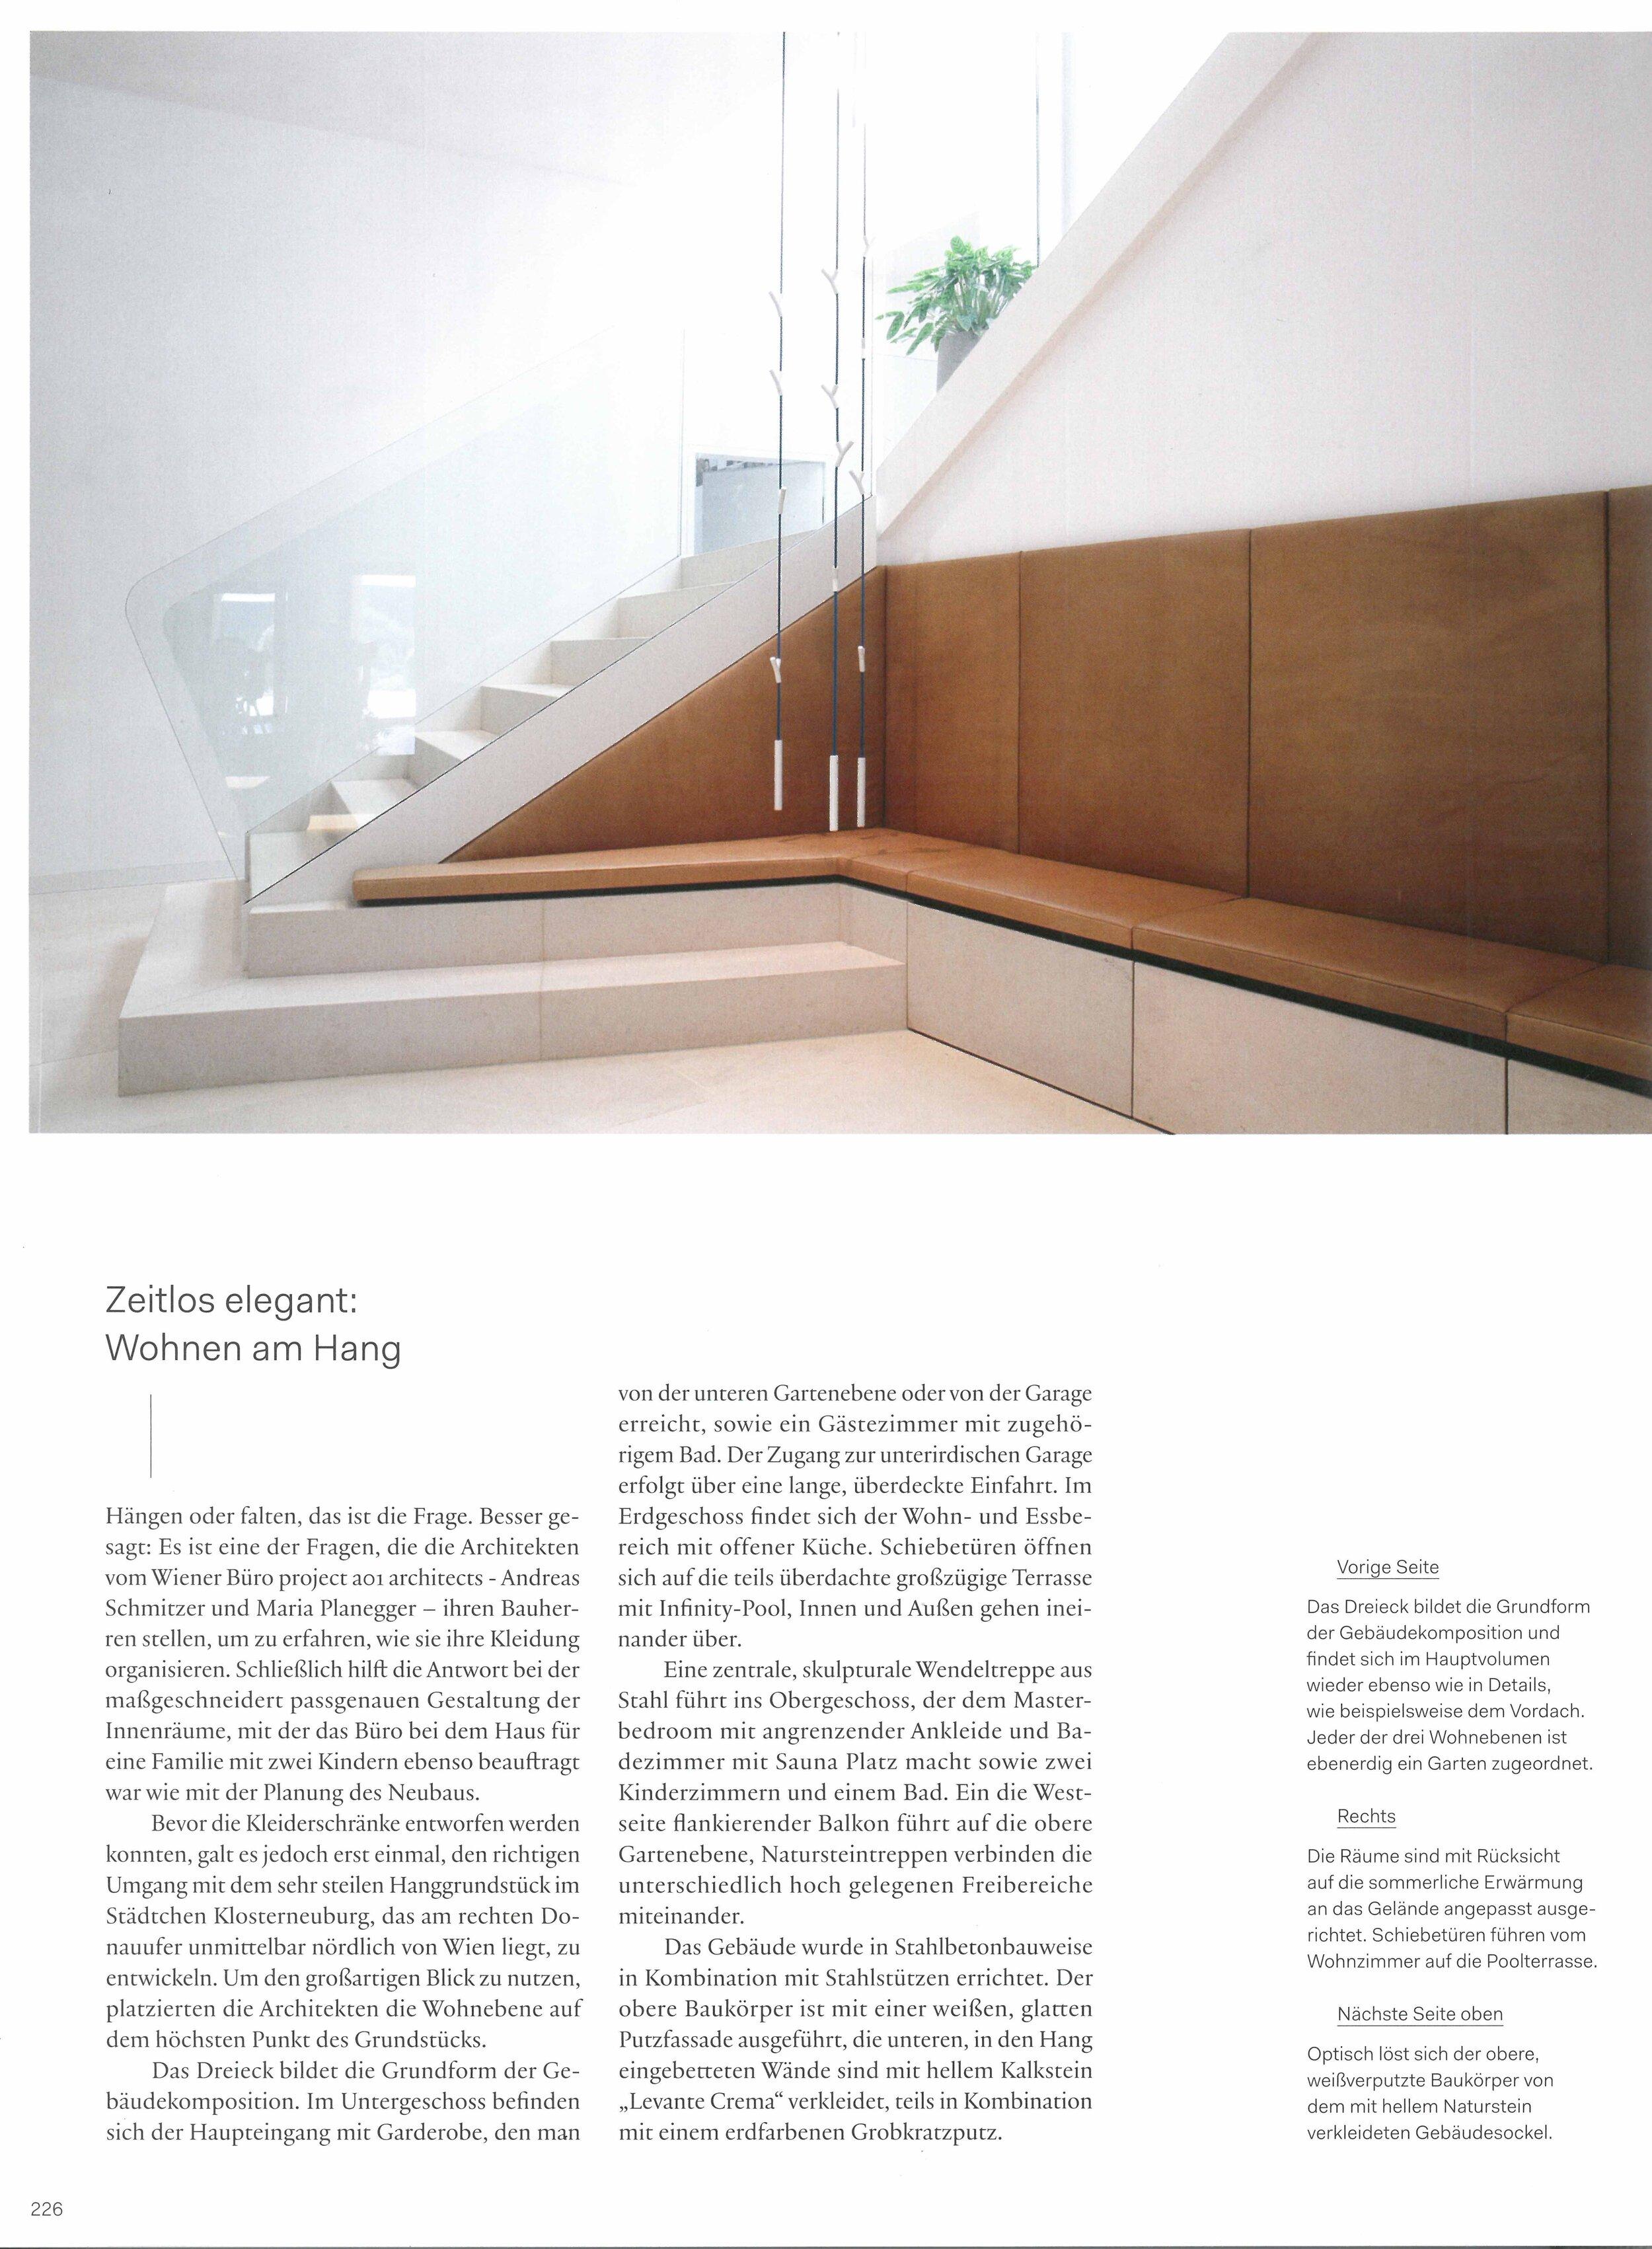 page-226.jpg